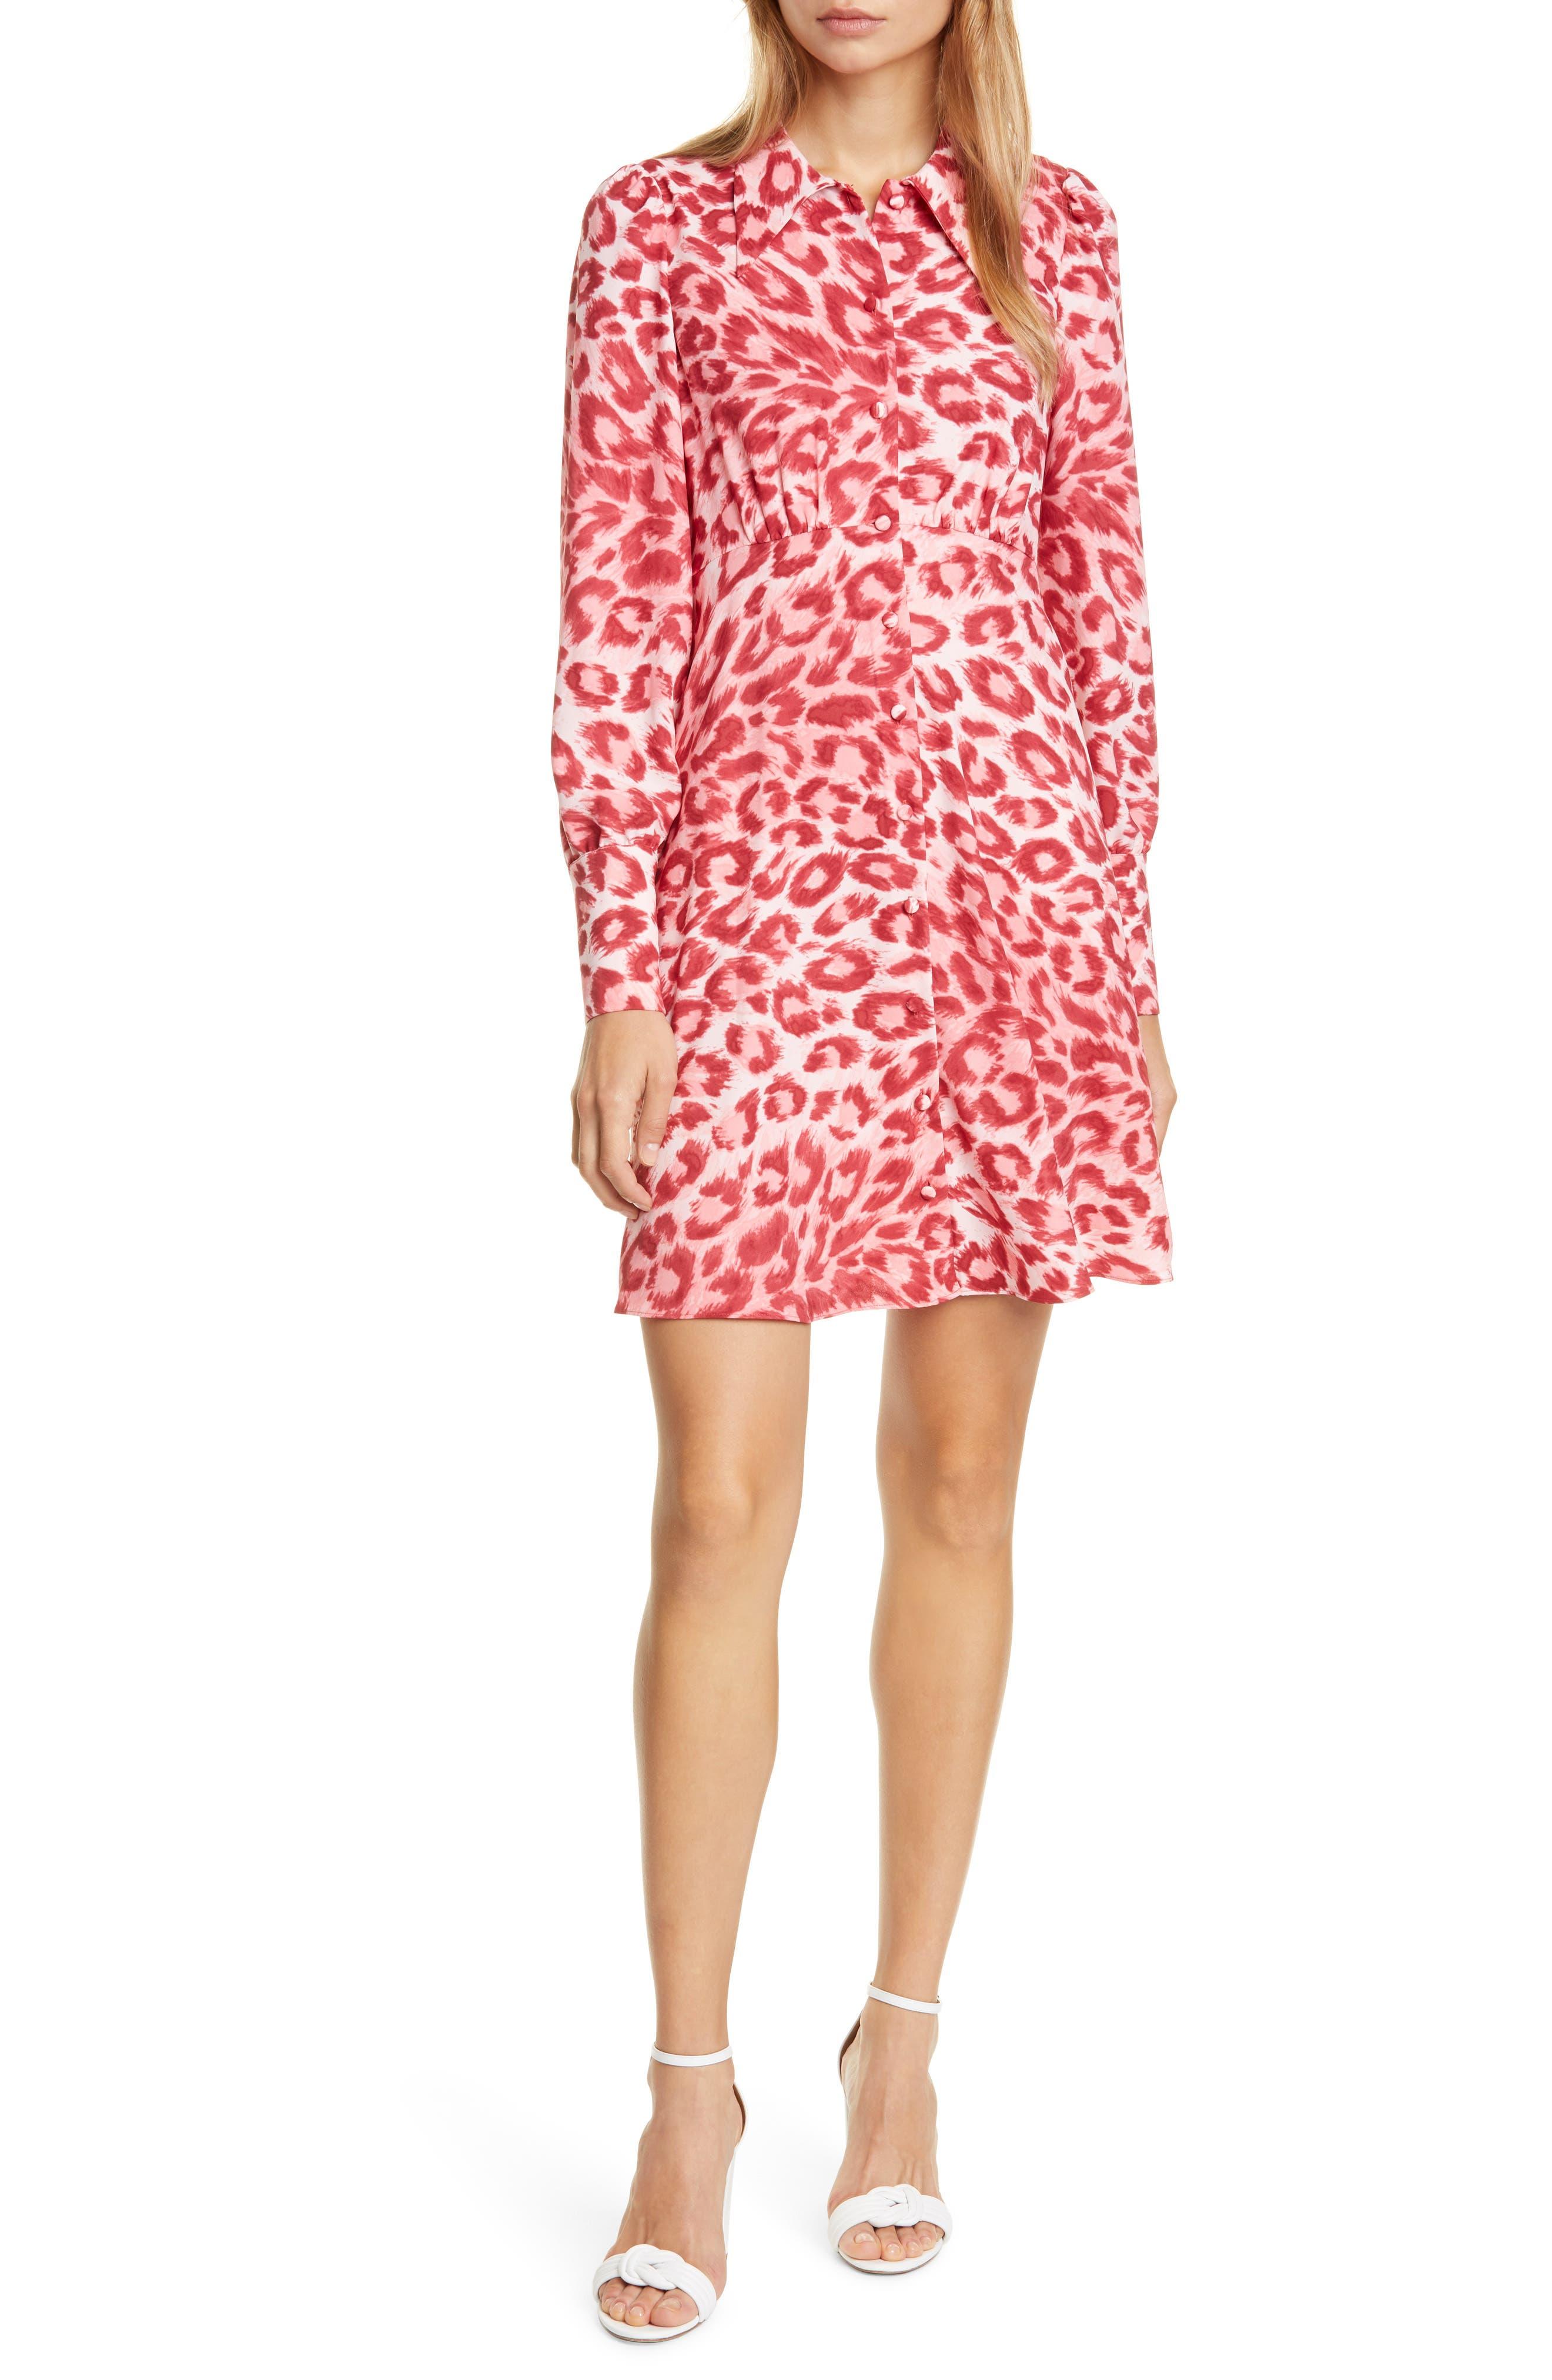 Kate Spade New York Dresses panthera long sleeve shirtdress